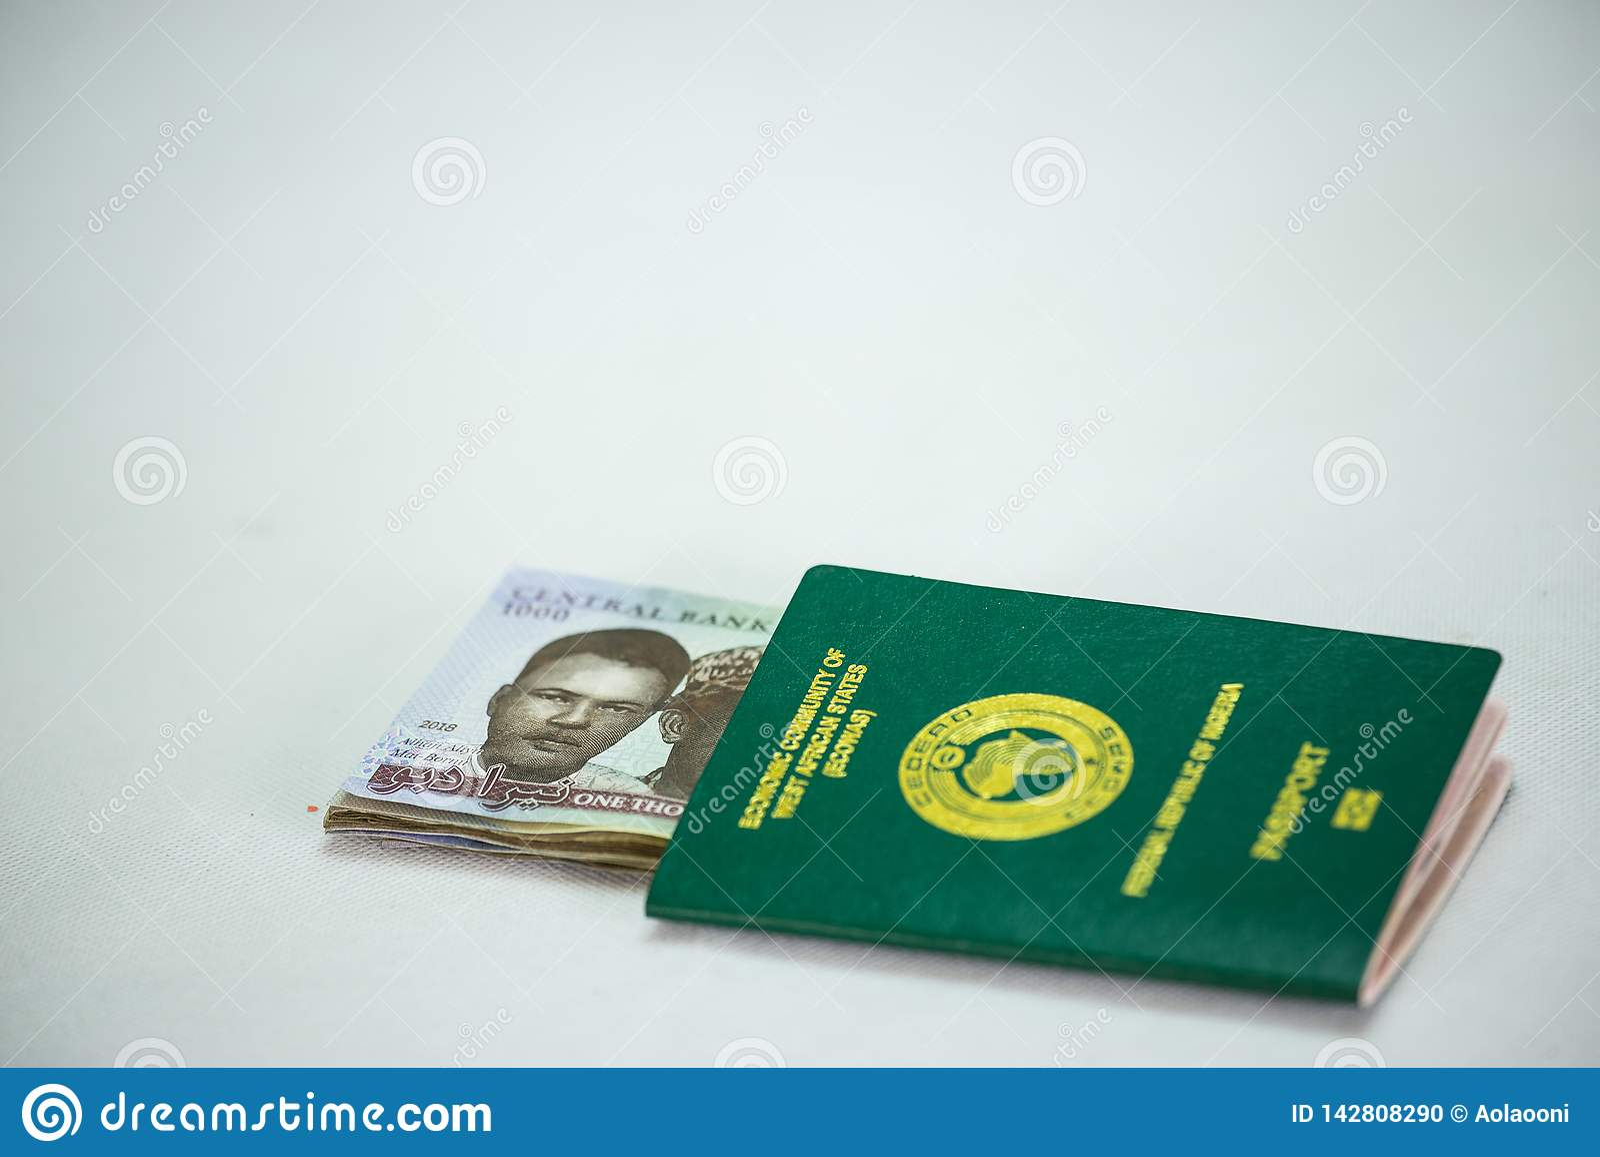 Passeport international avec des notes de Naira